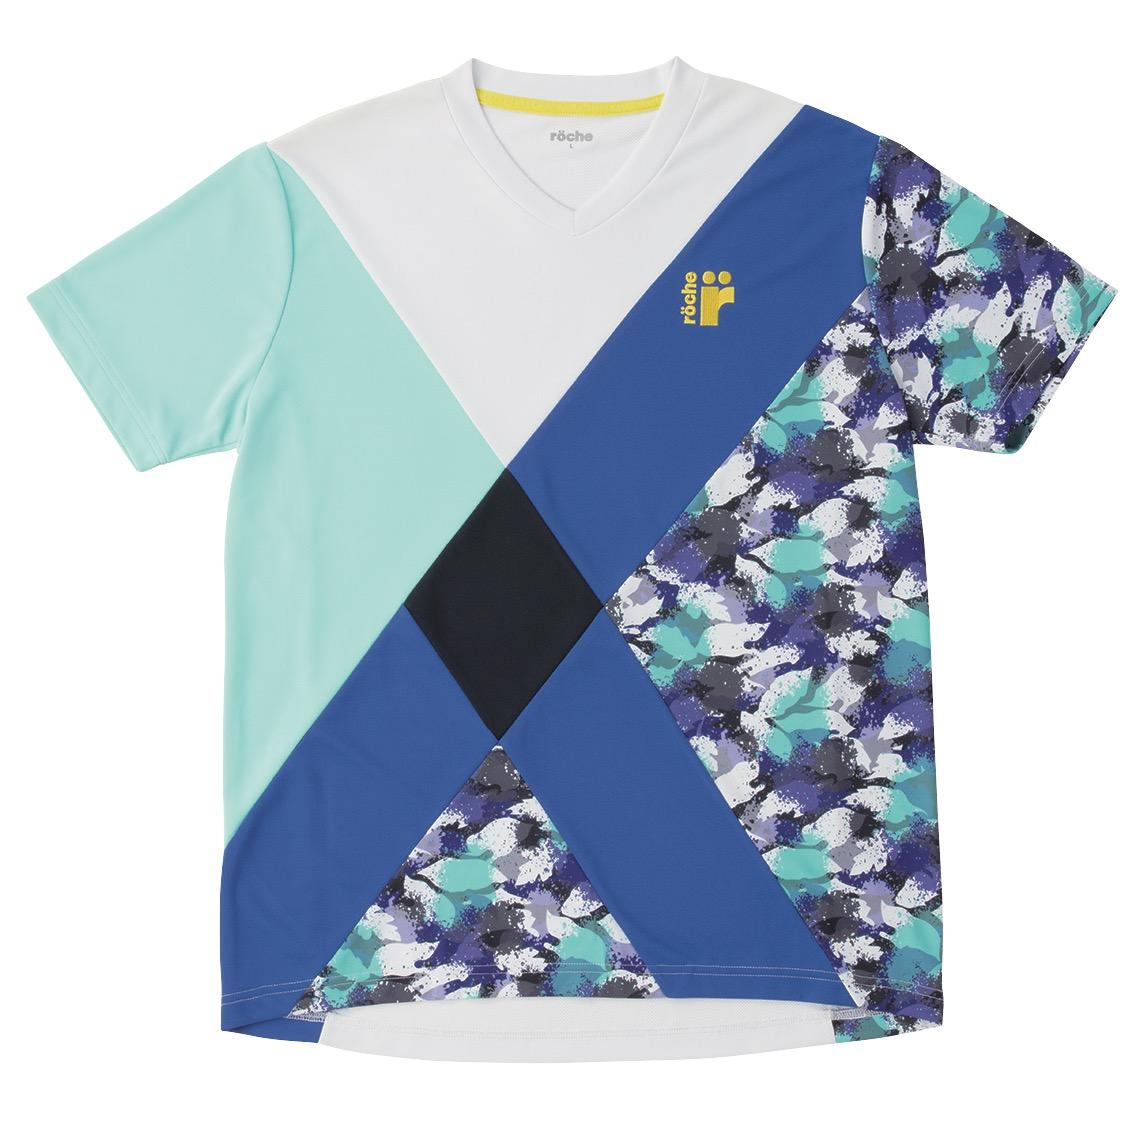 <small>R9S02V<br>メンズゲームシャツ</small>